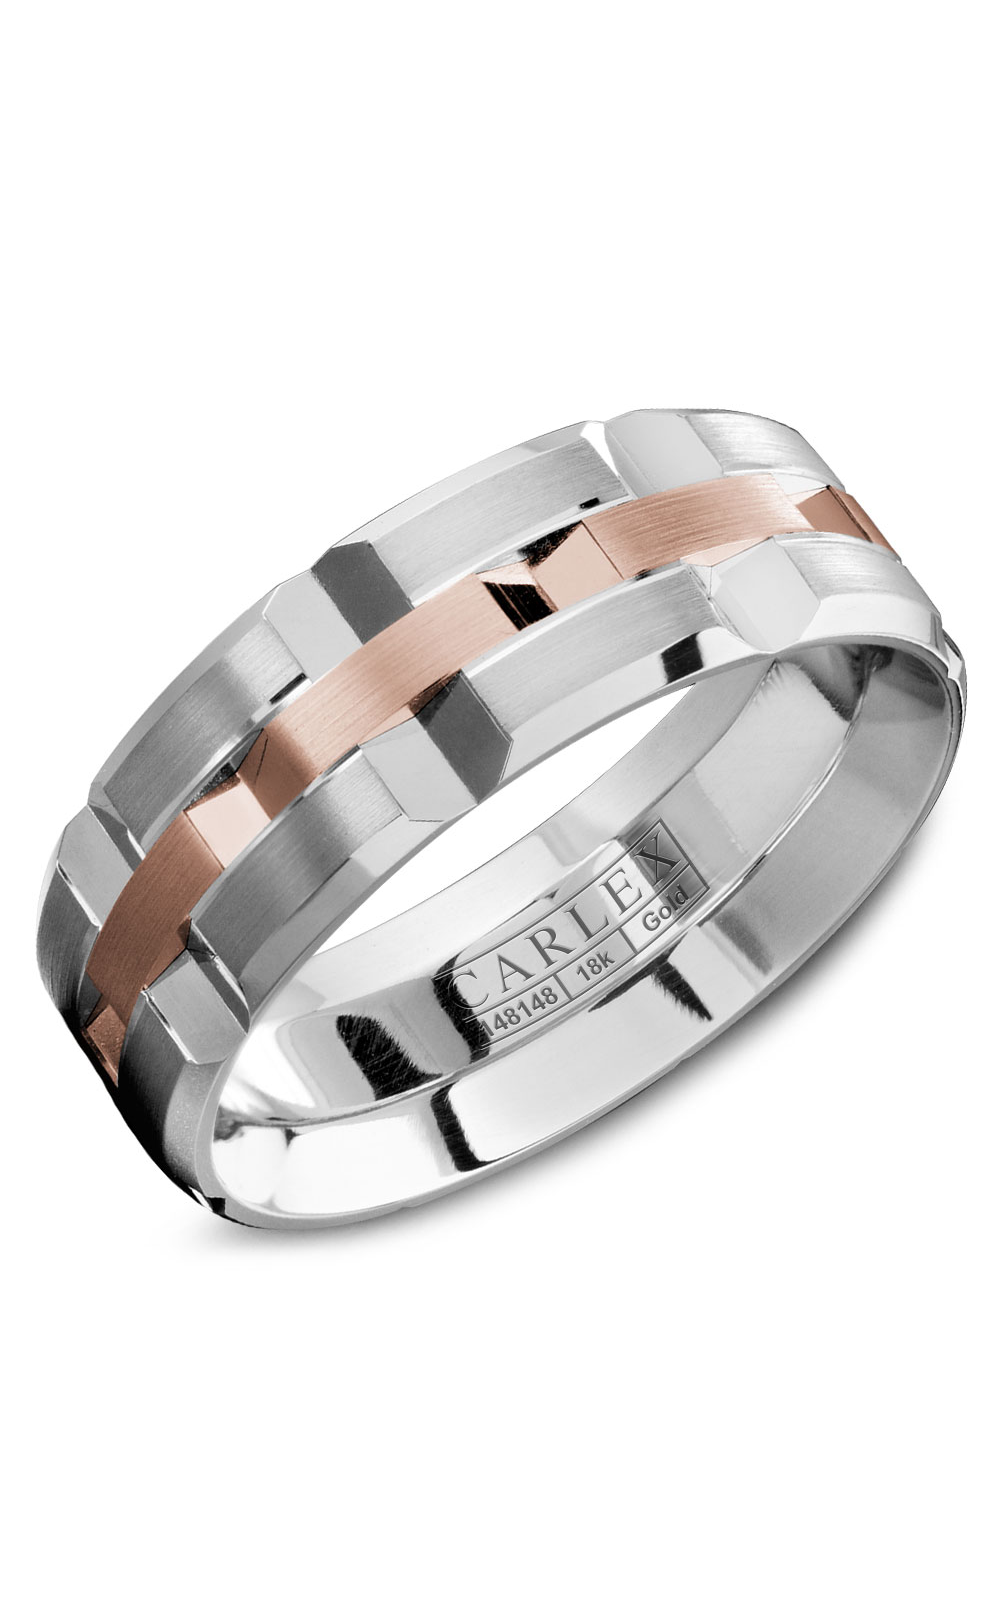 Carlex G1 Men's Wedding Band WB-9168RW product image